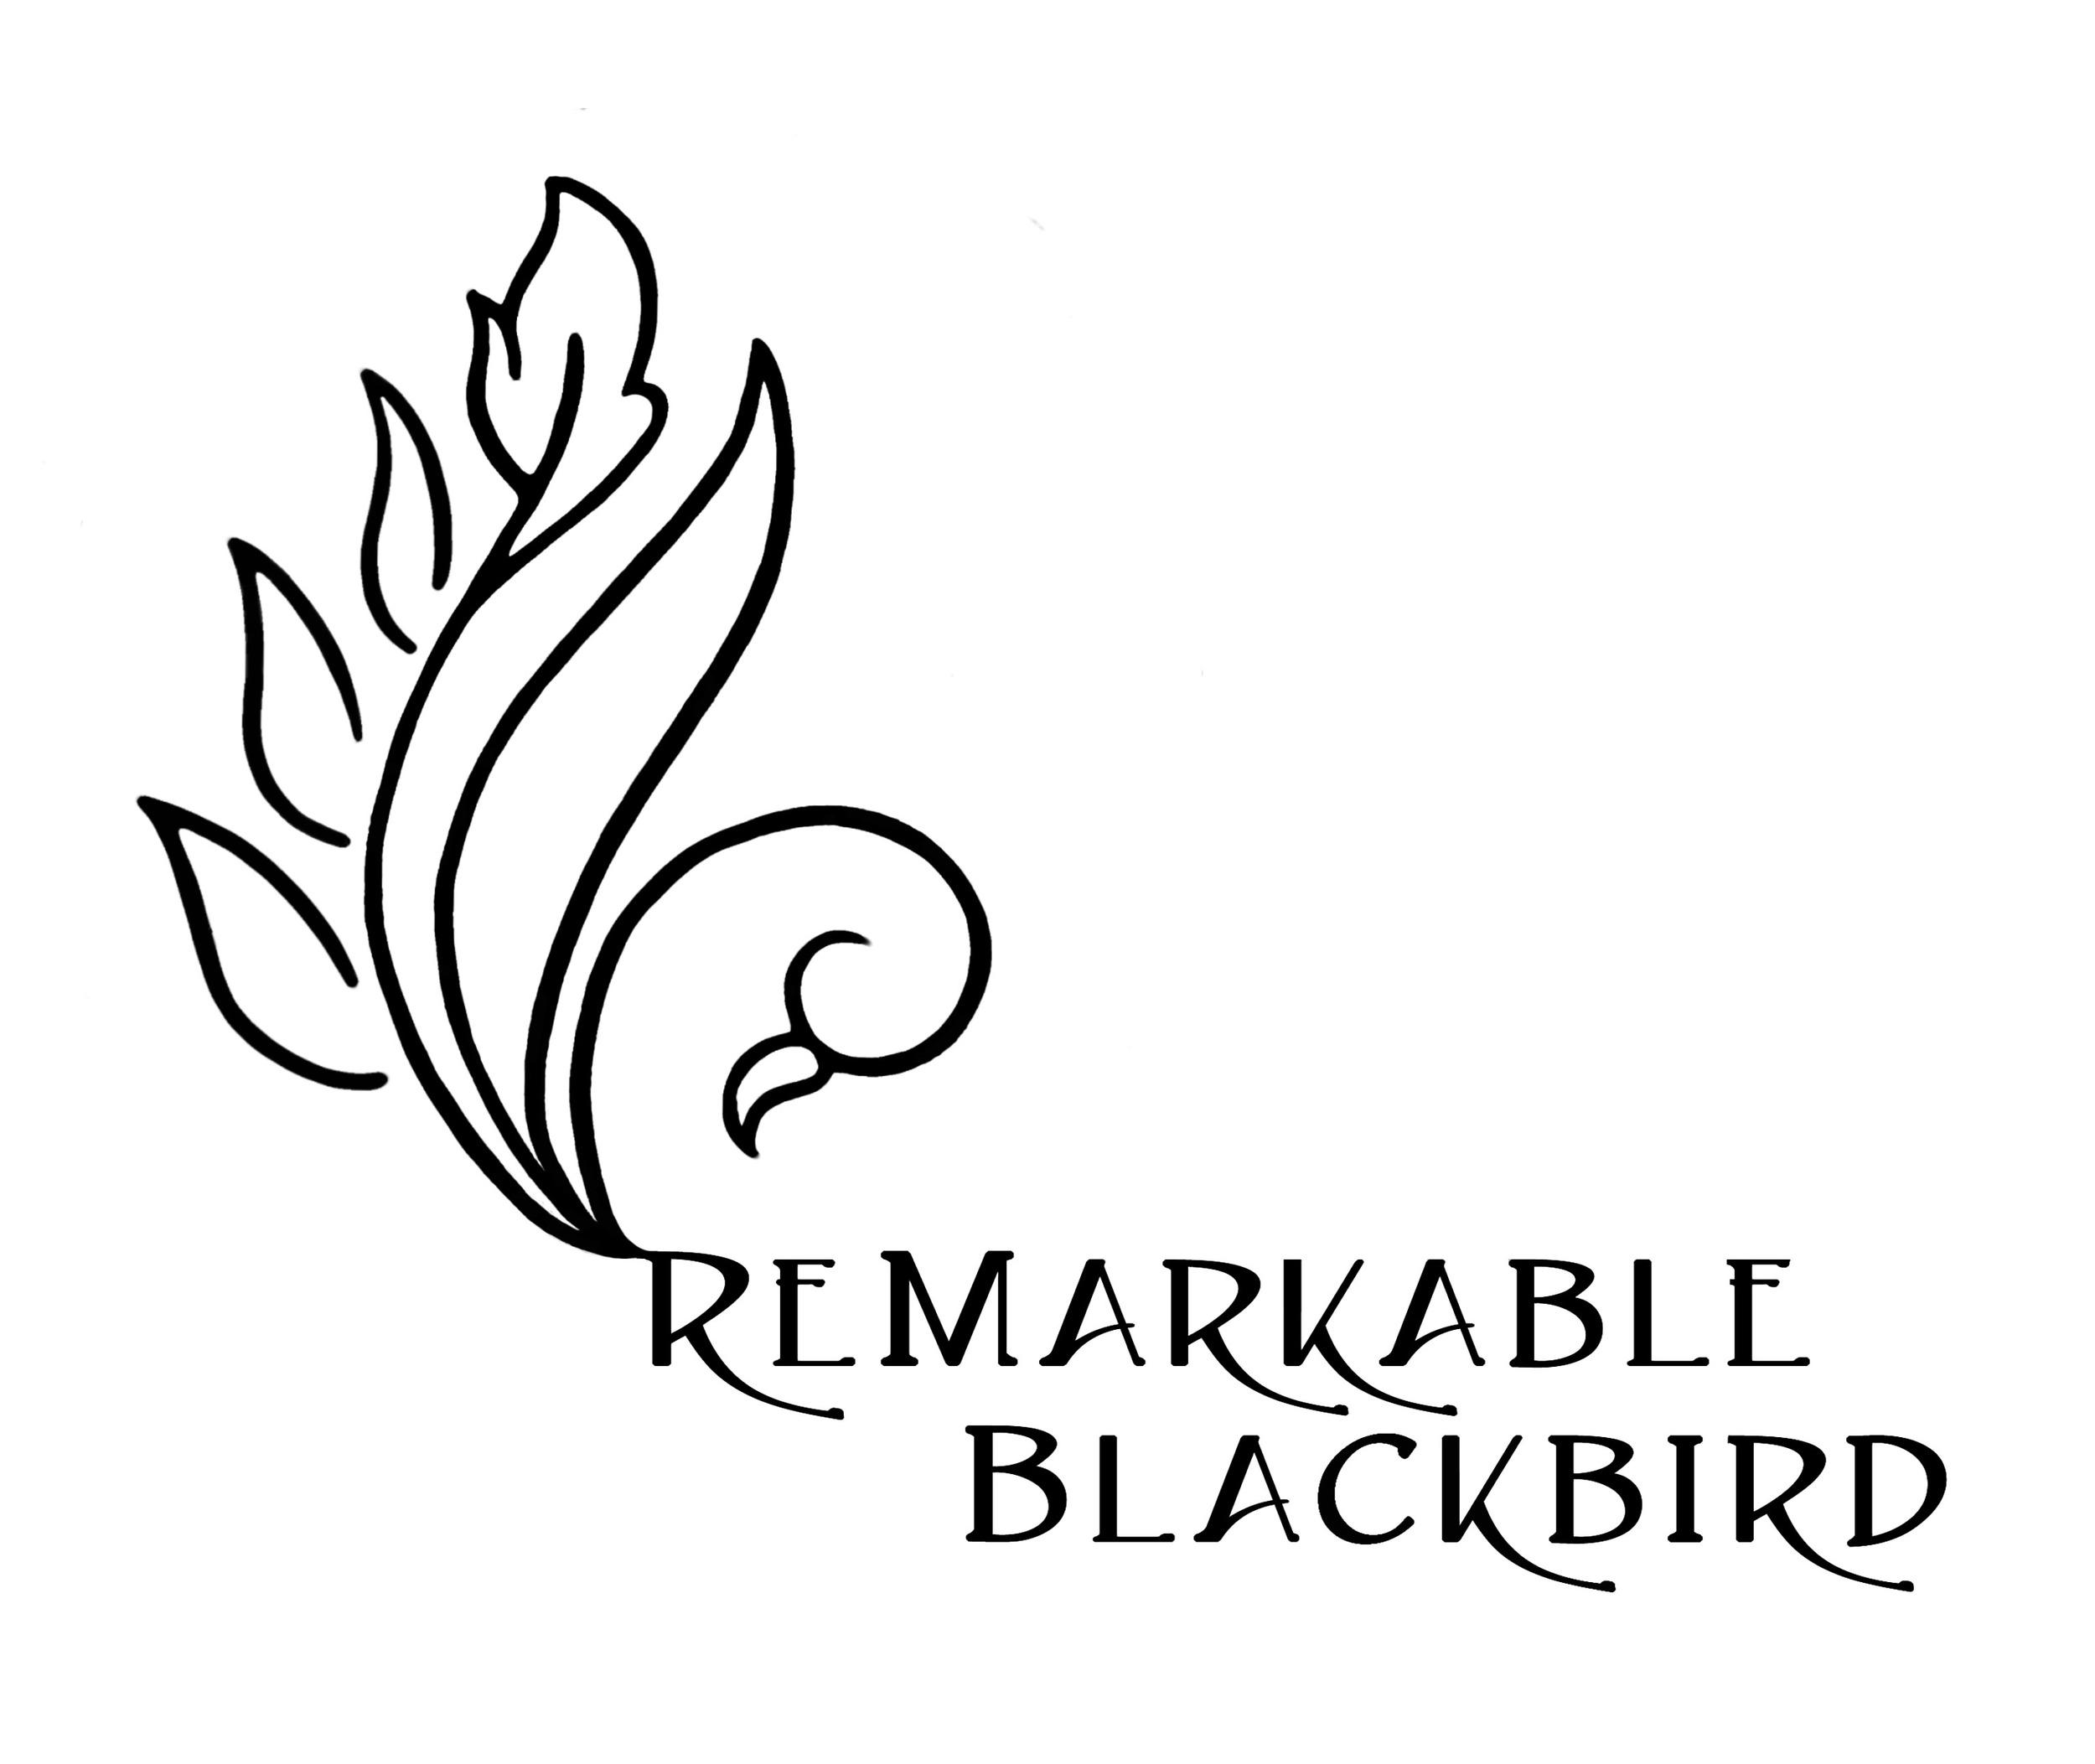 Remarkable Blackbird.jpg